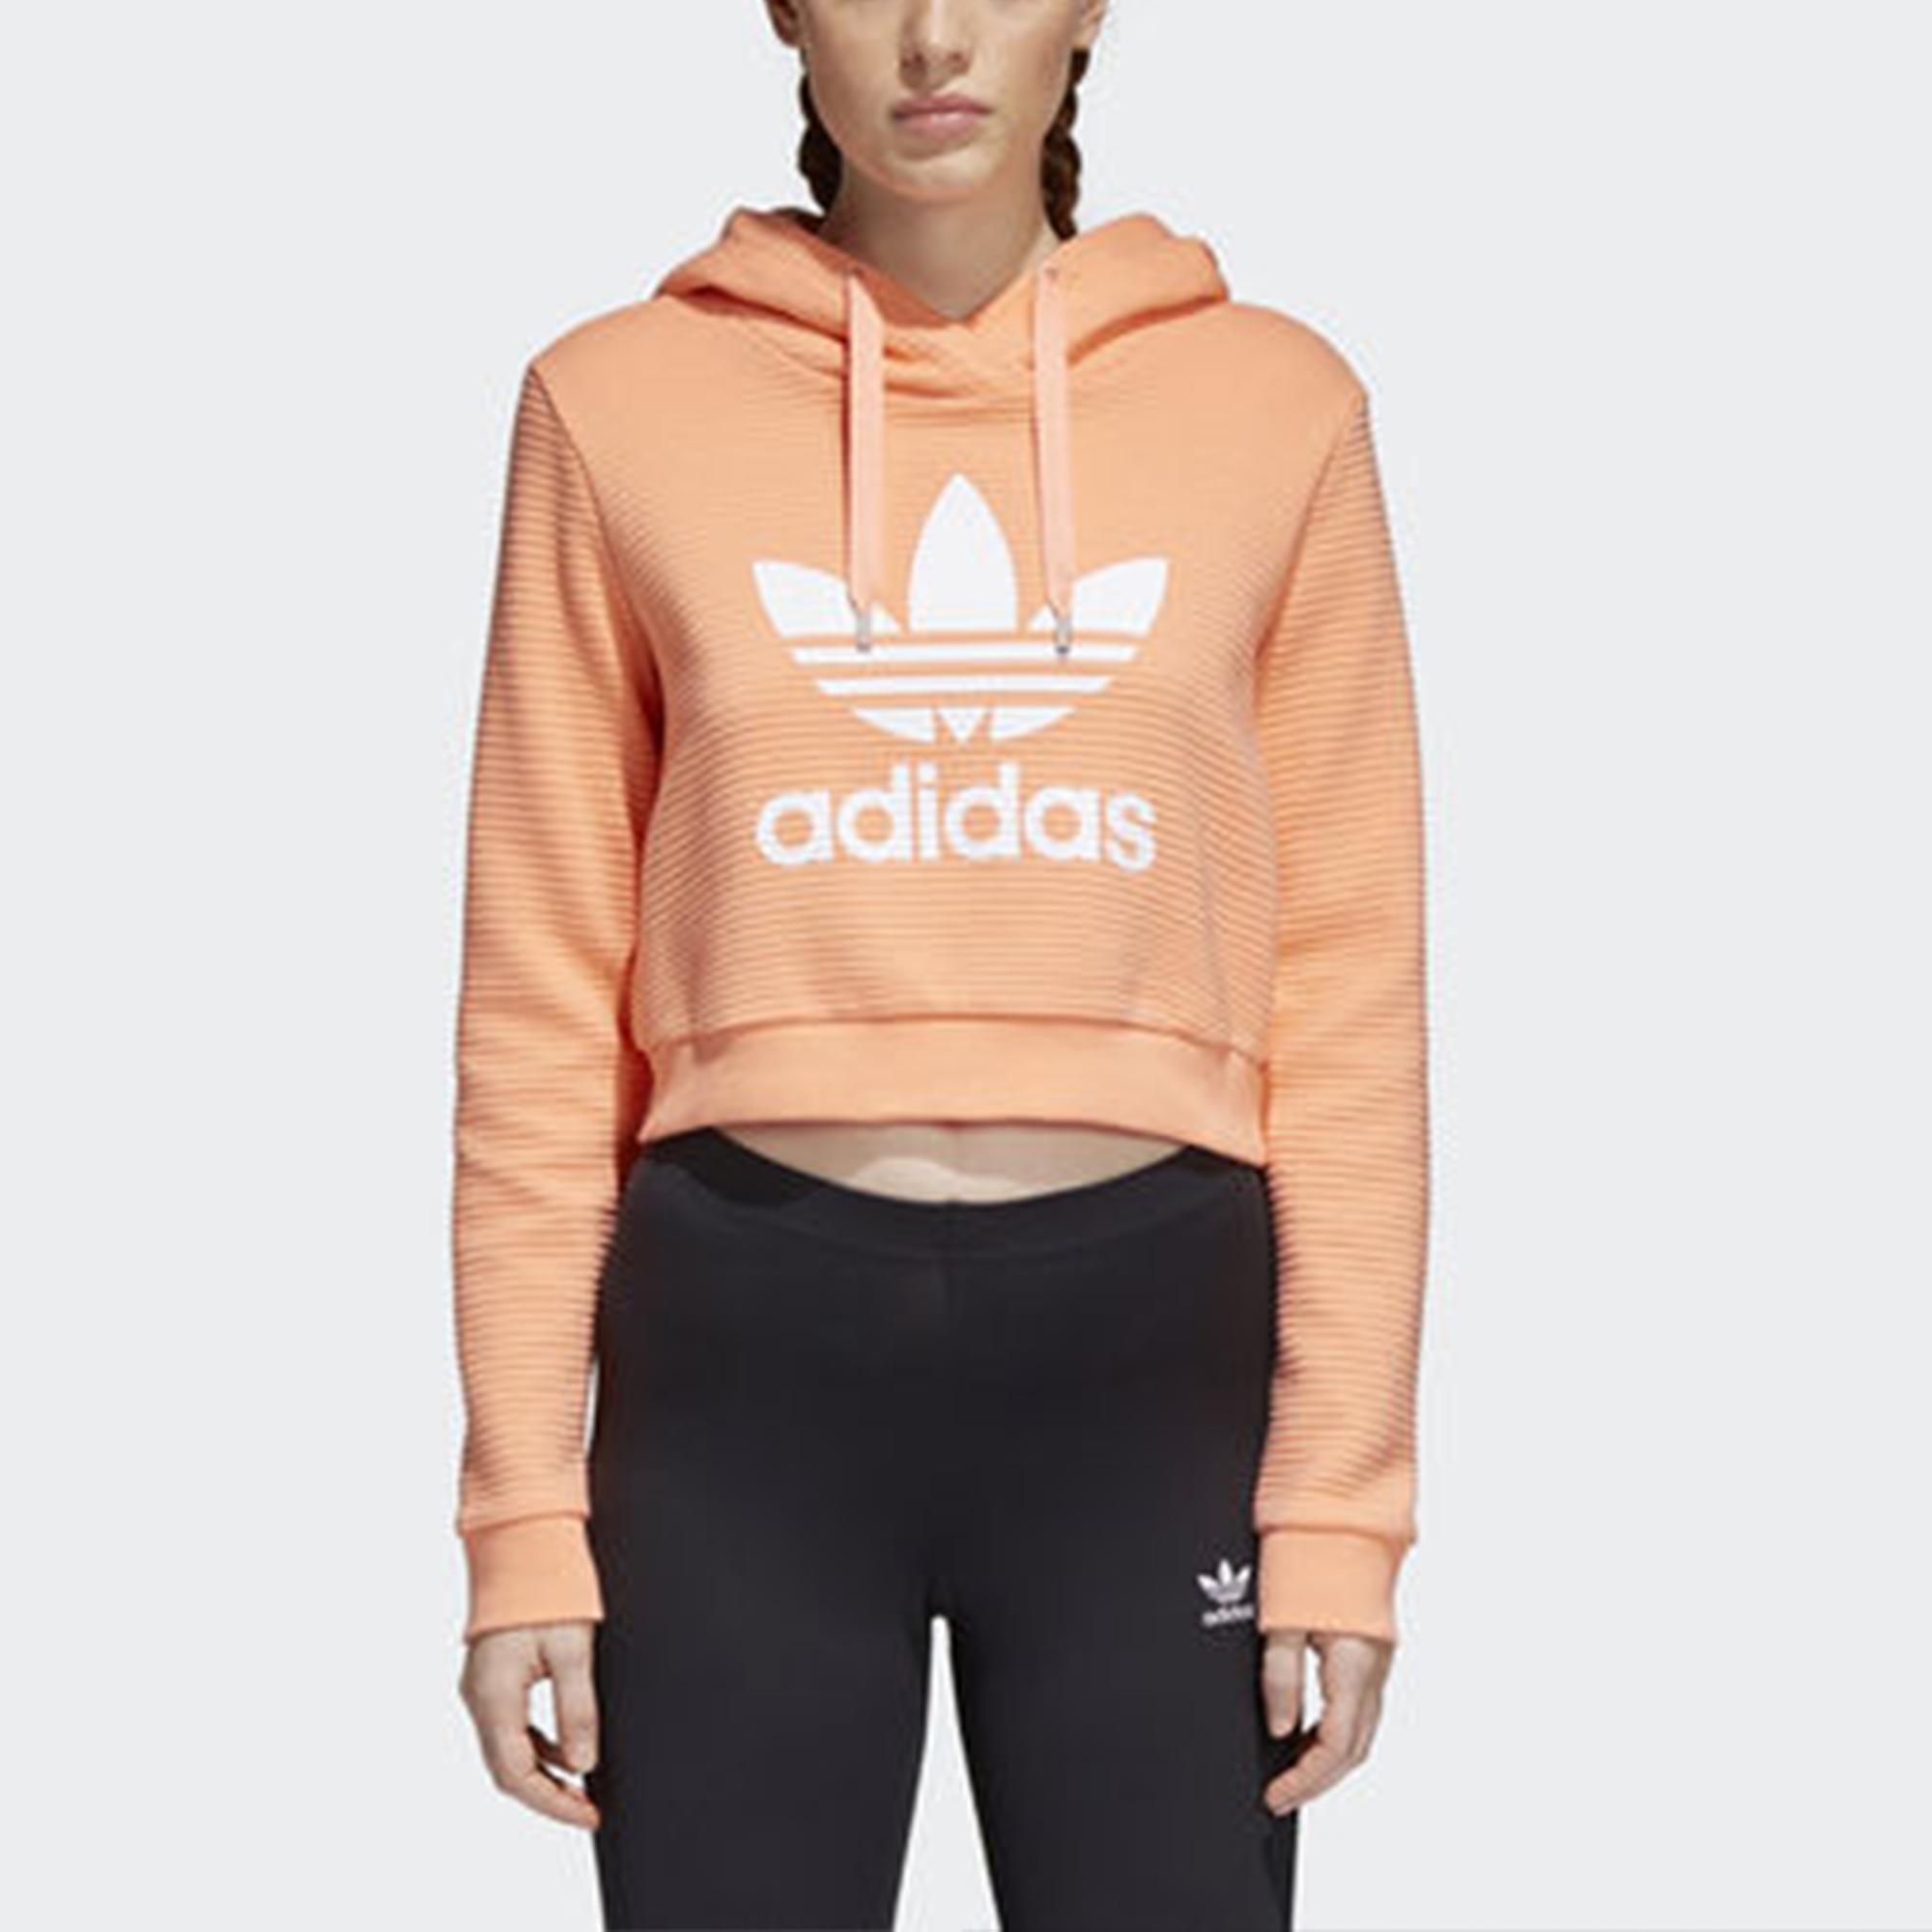 Adidas Originals Trefoil Cropped Hoodie